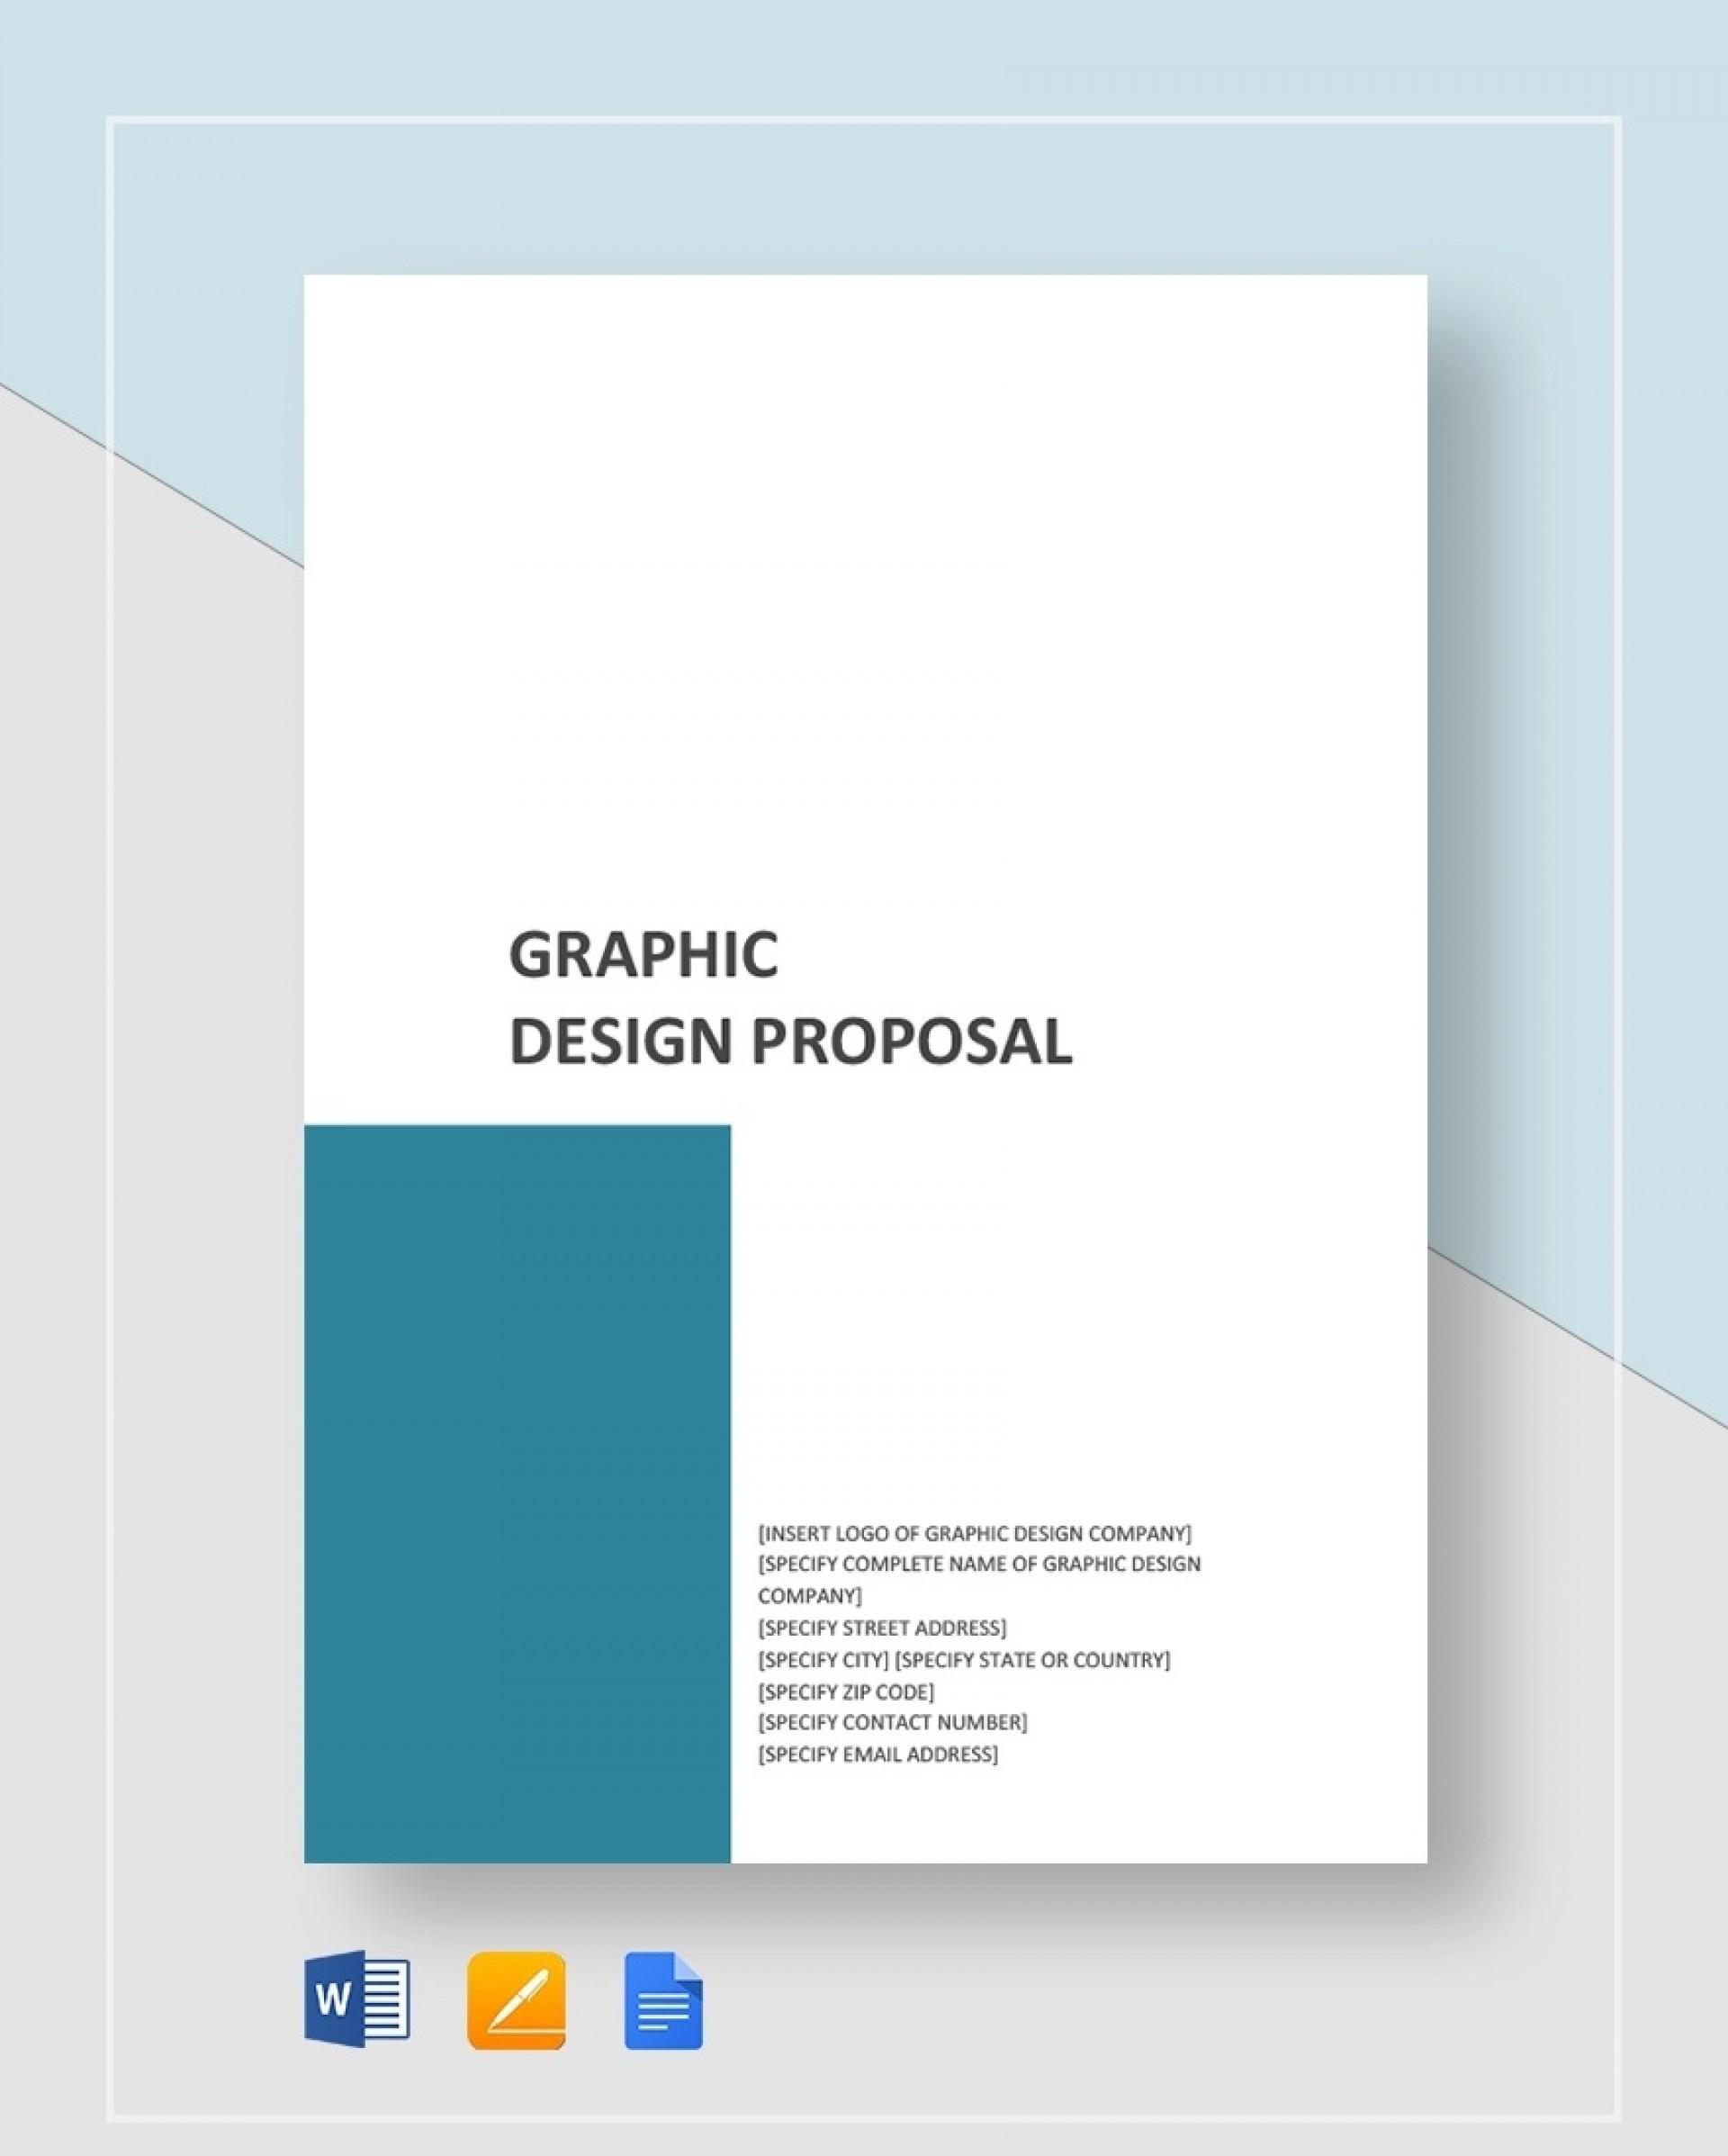 Template Graphic Design Proposal Idea  Sample Pdf Doc Word1920